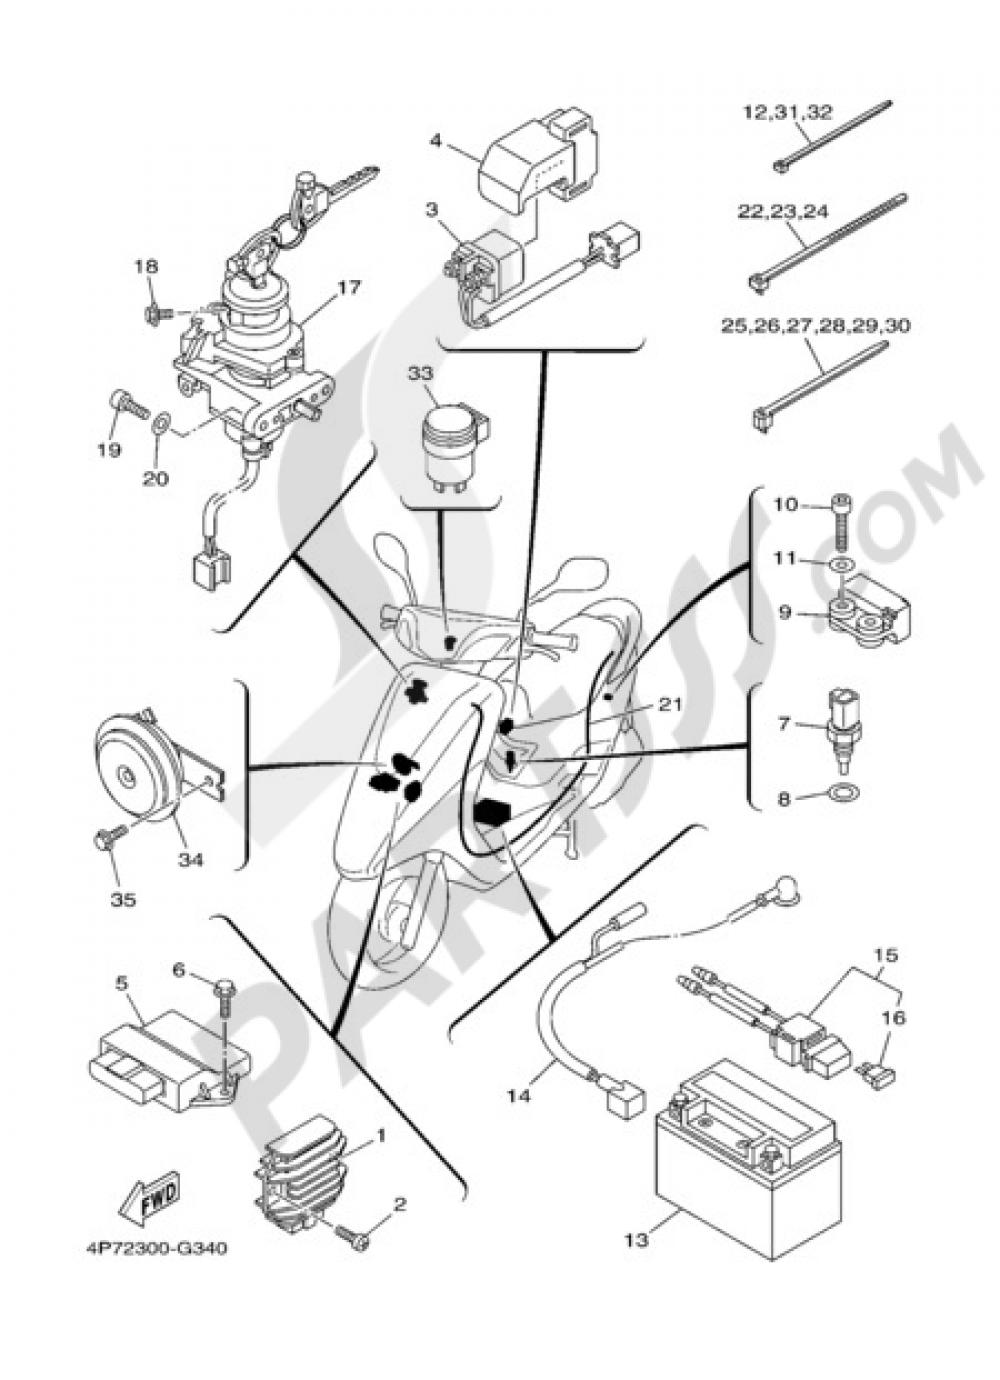 medium resolution of electric equipment 1 yamaha vity 125 2009 rh partsss com yamaha cygnus 125 wiring diagram yamaha majesty 125 wiring diagram